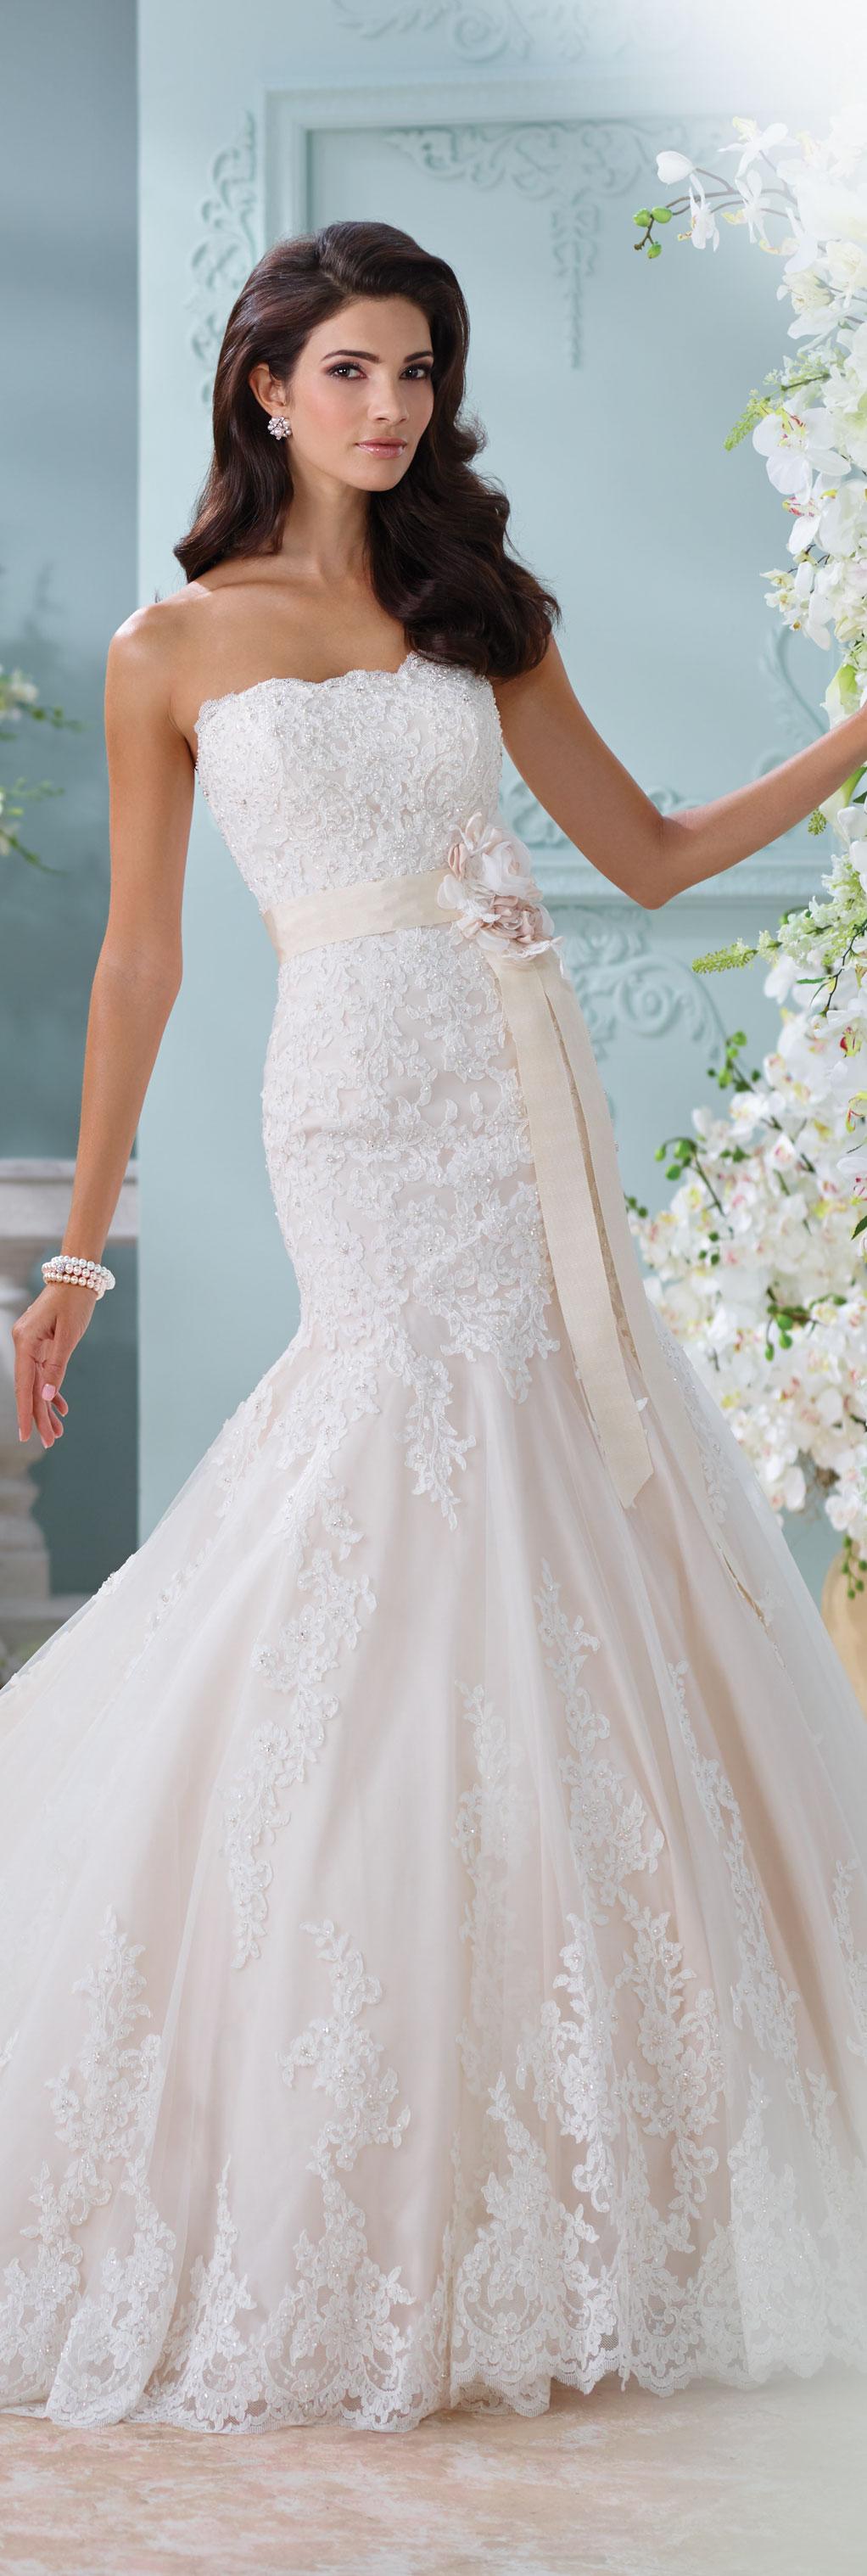 9cf620f7e63 The David Tutera for Mon Cheri Spring 2016 Wedding Gown Collection - Style  No. 116225 Thea  laceweddingdress